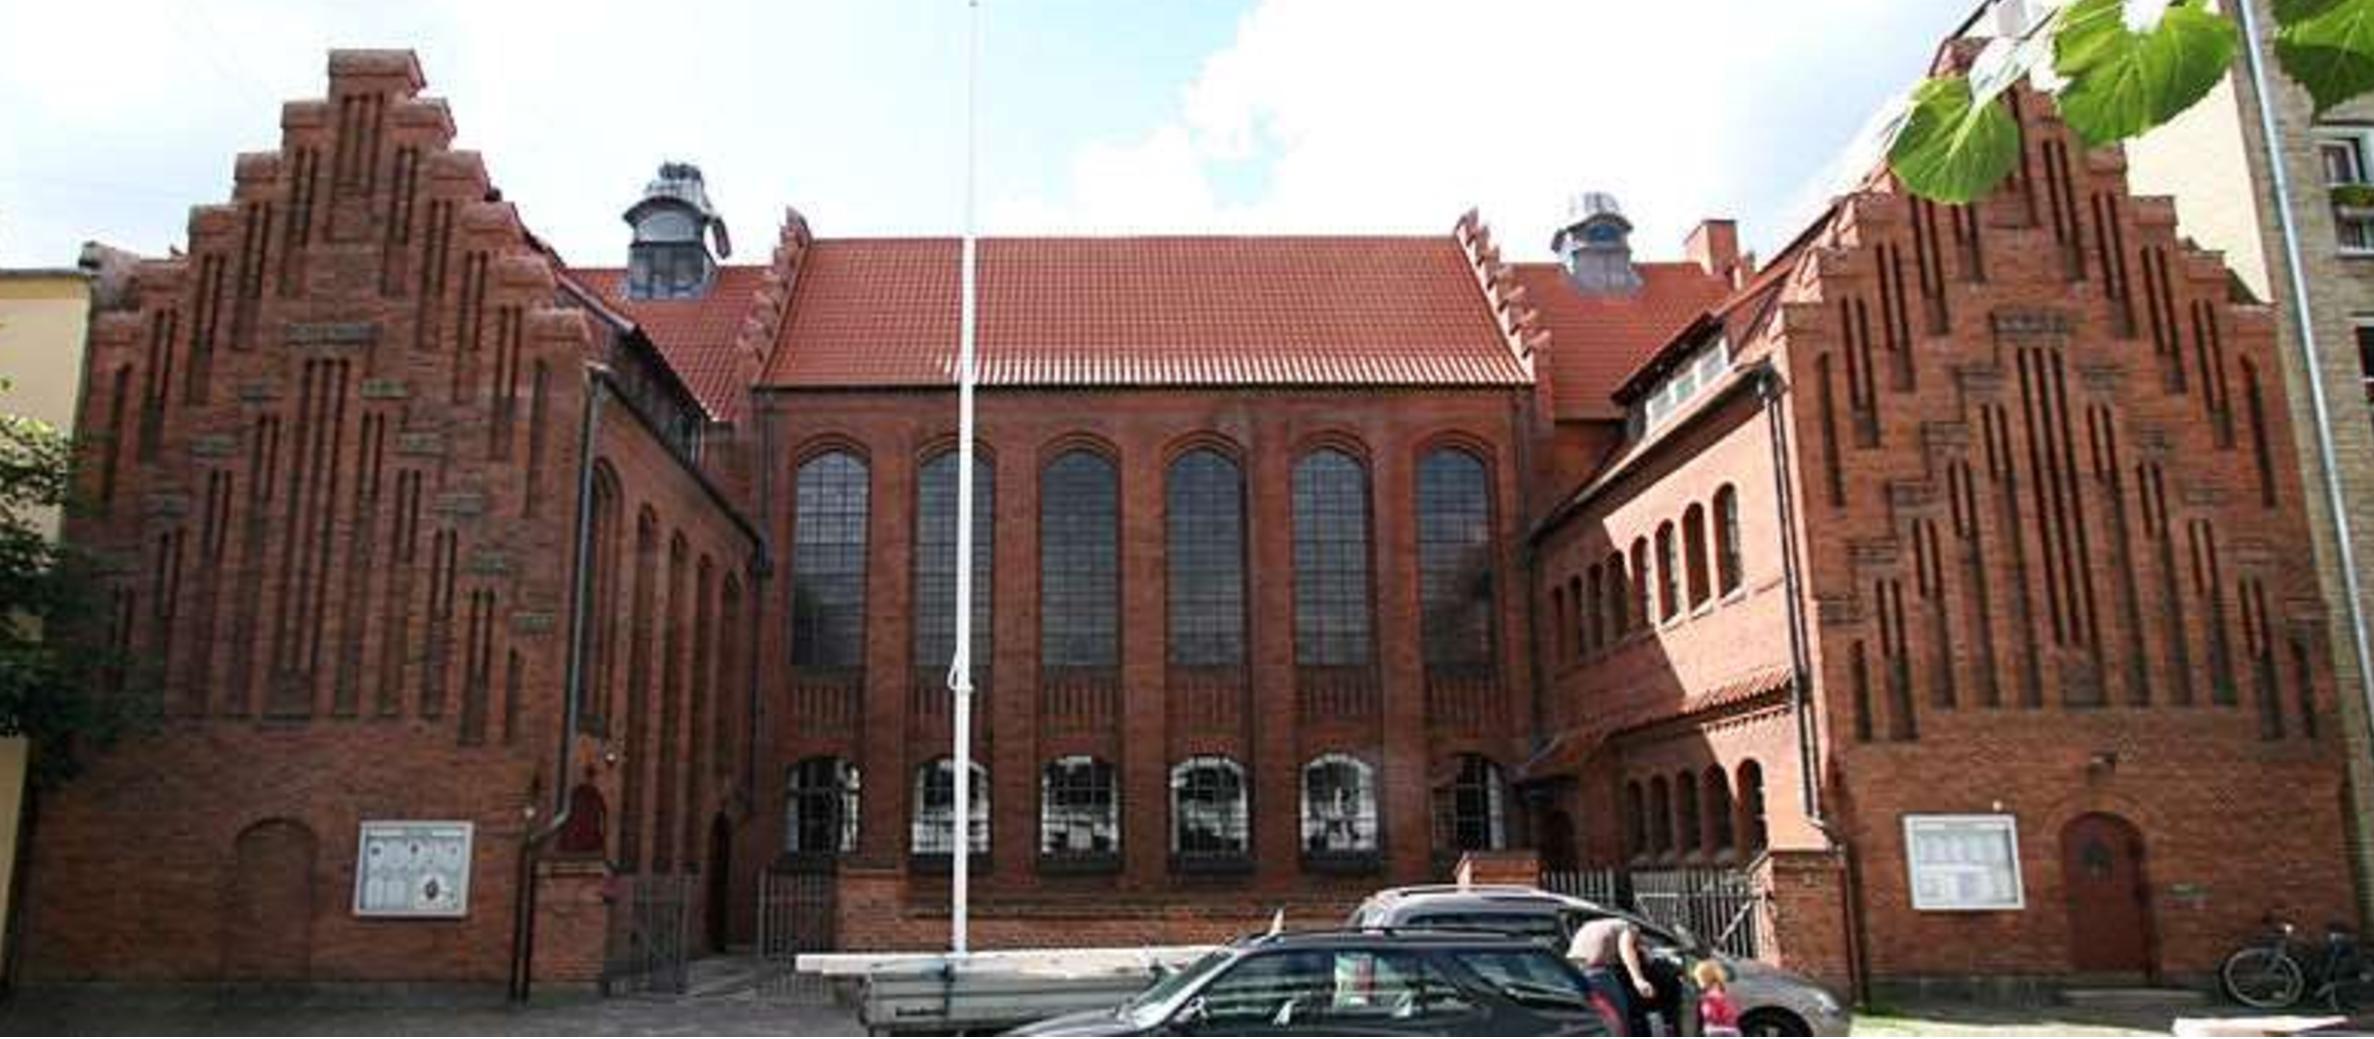 Denmark: Church vandalised in anti-Semitic attack